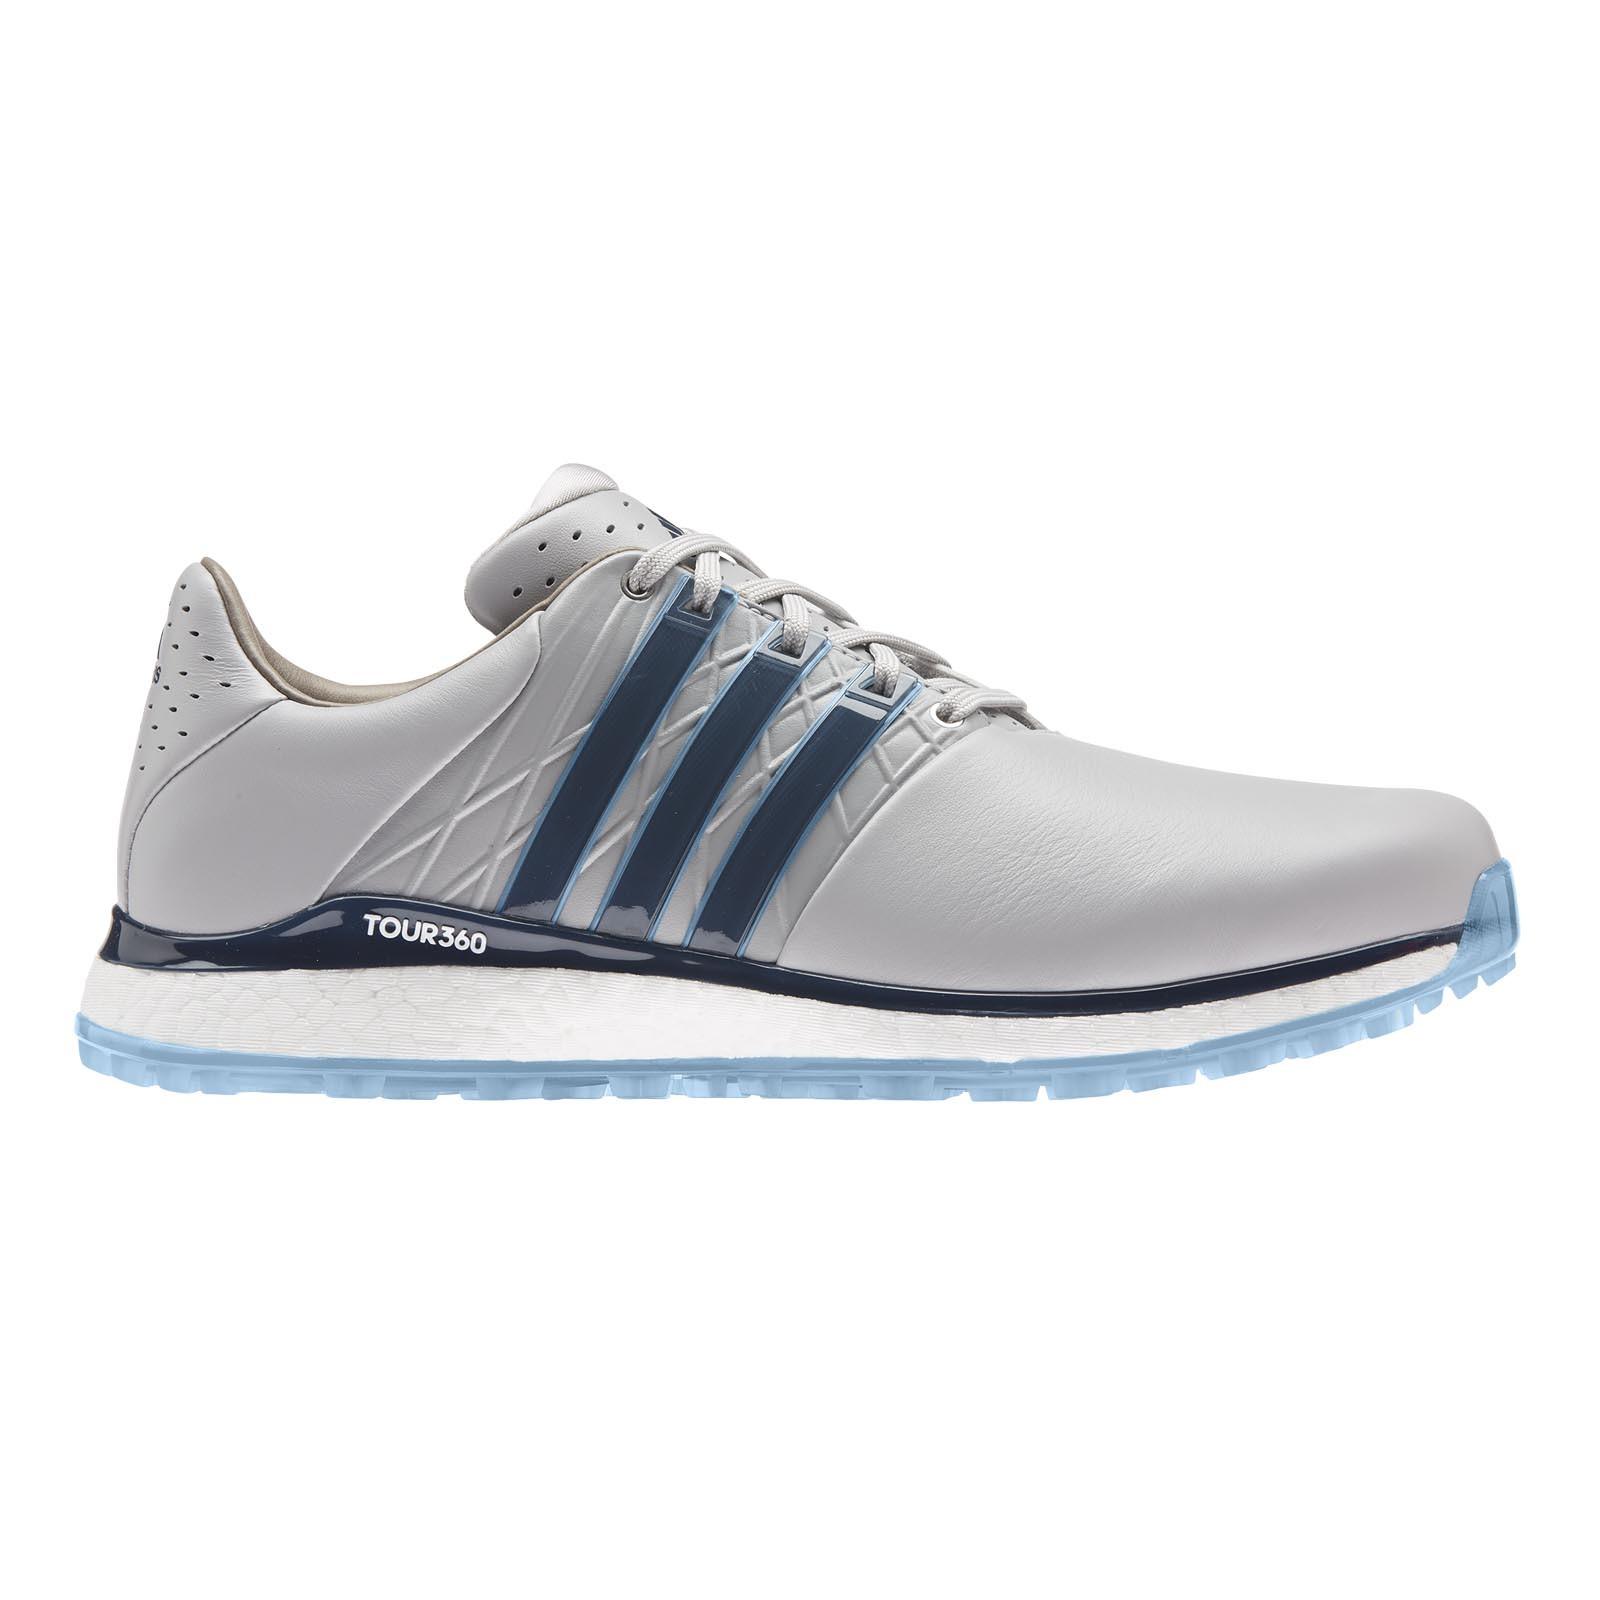 adidas Tour360 XT-SL 2 Golf Shoes